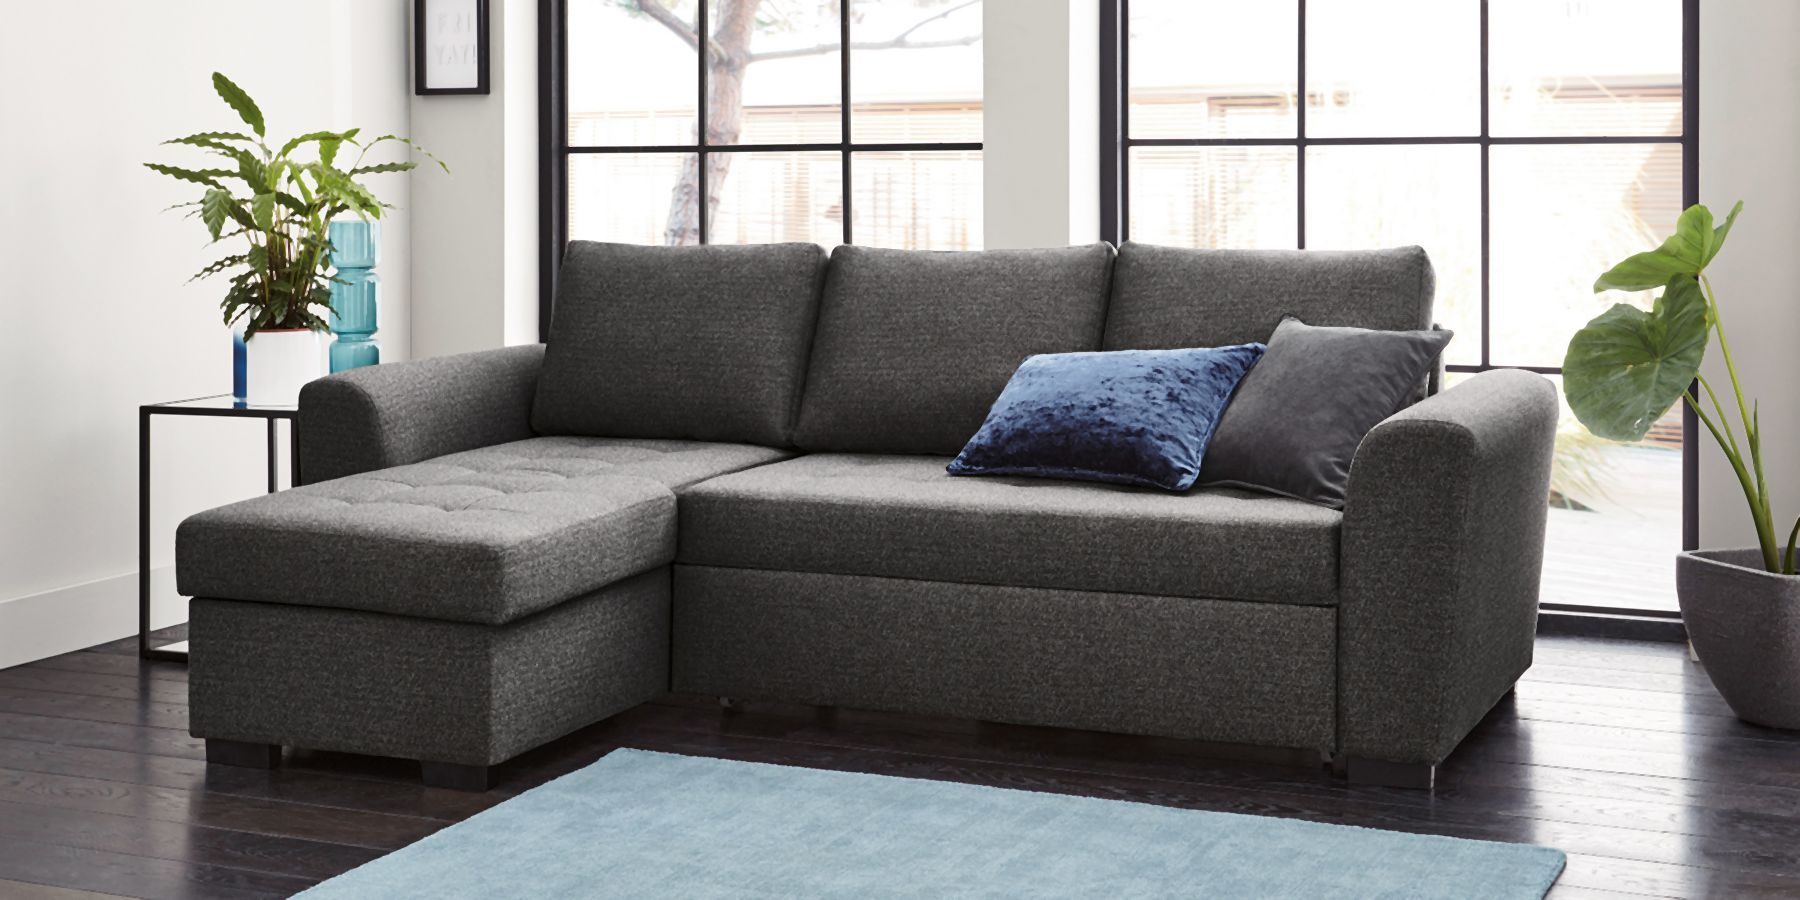 Buy Quentin Universal Corner Storage Sofabed (4 Seats